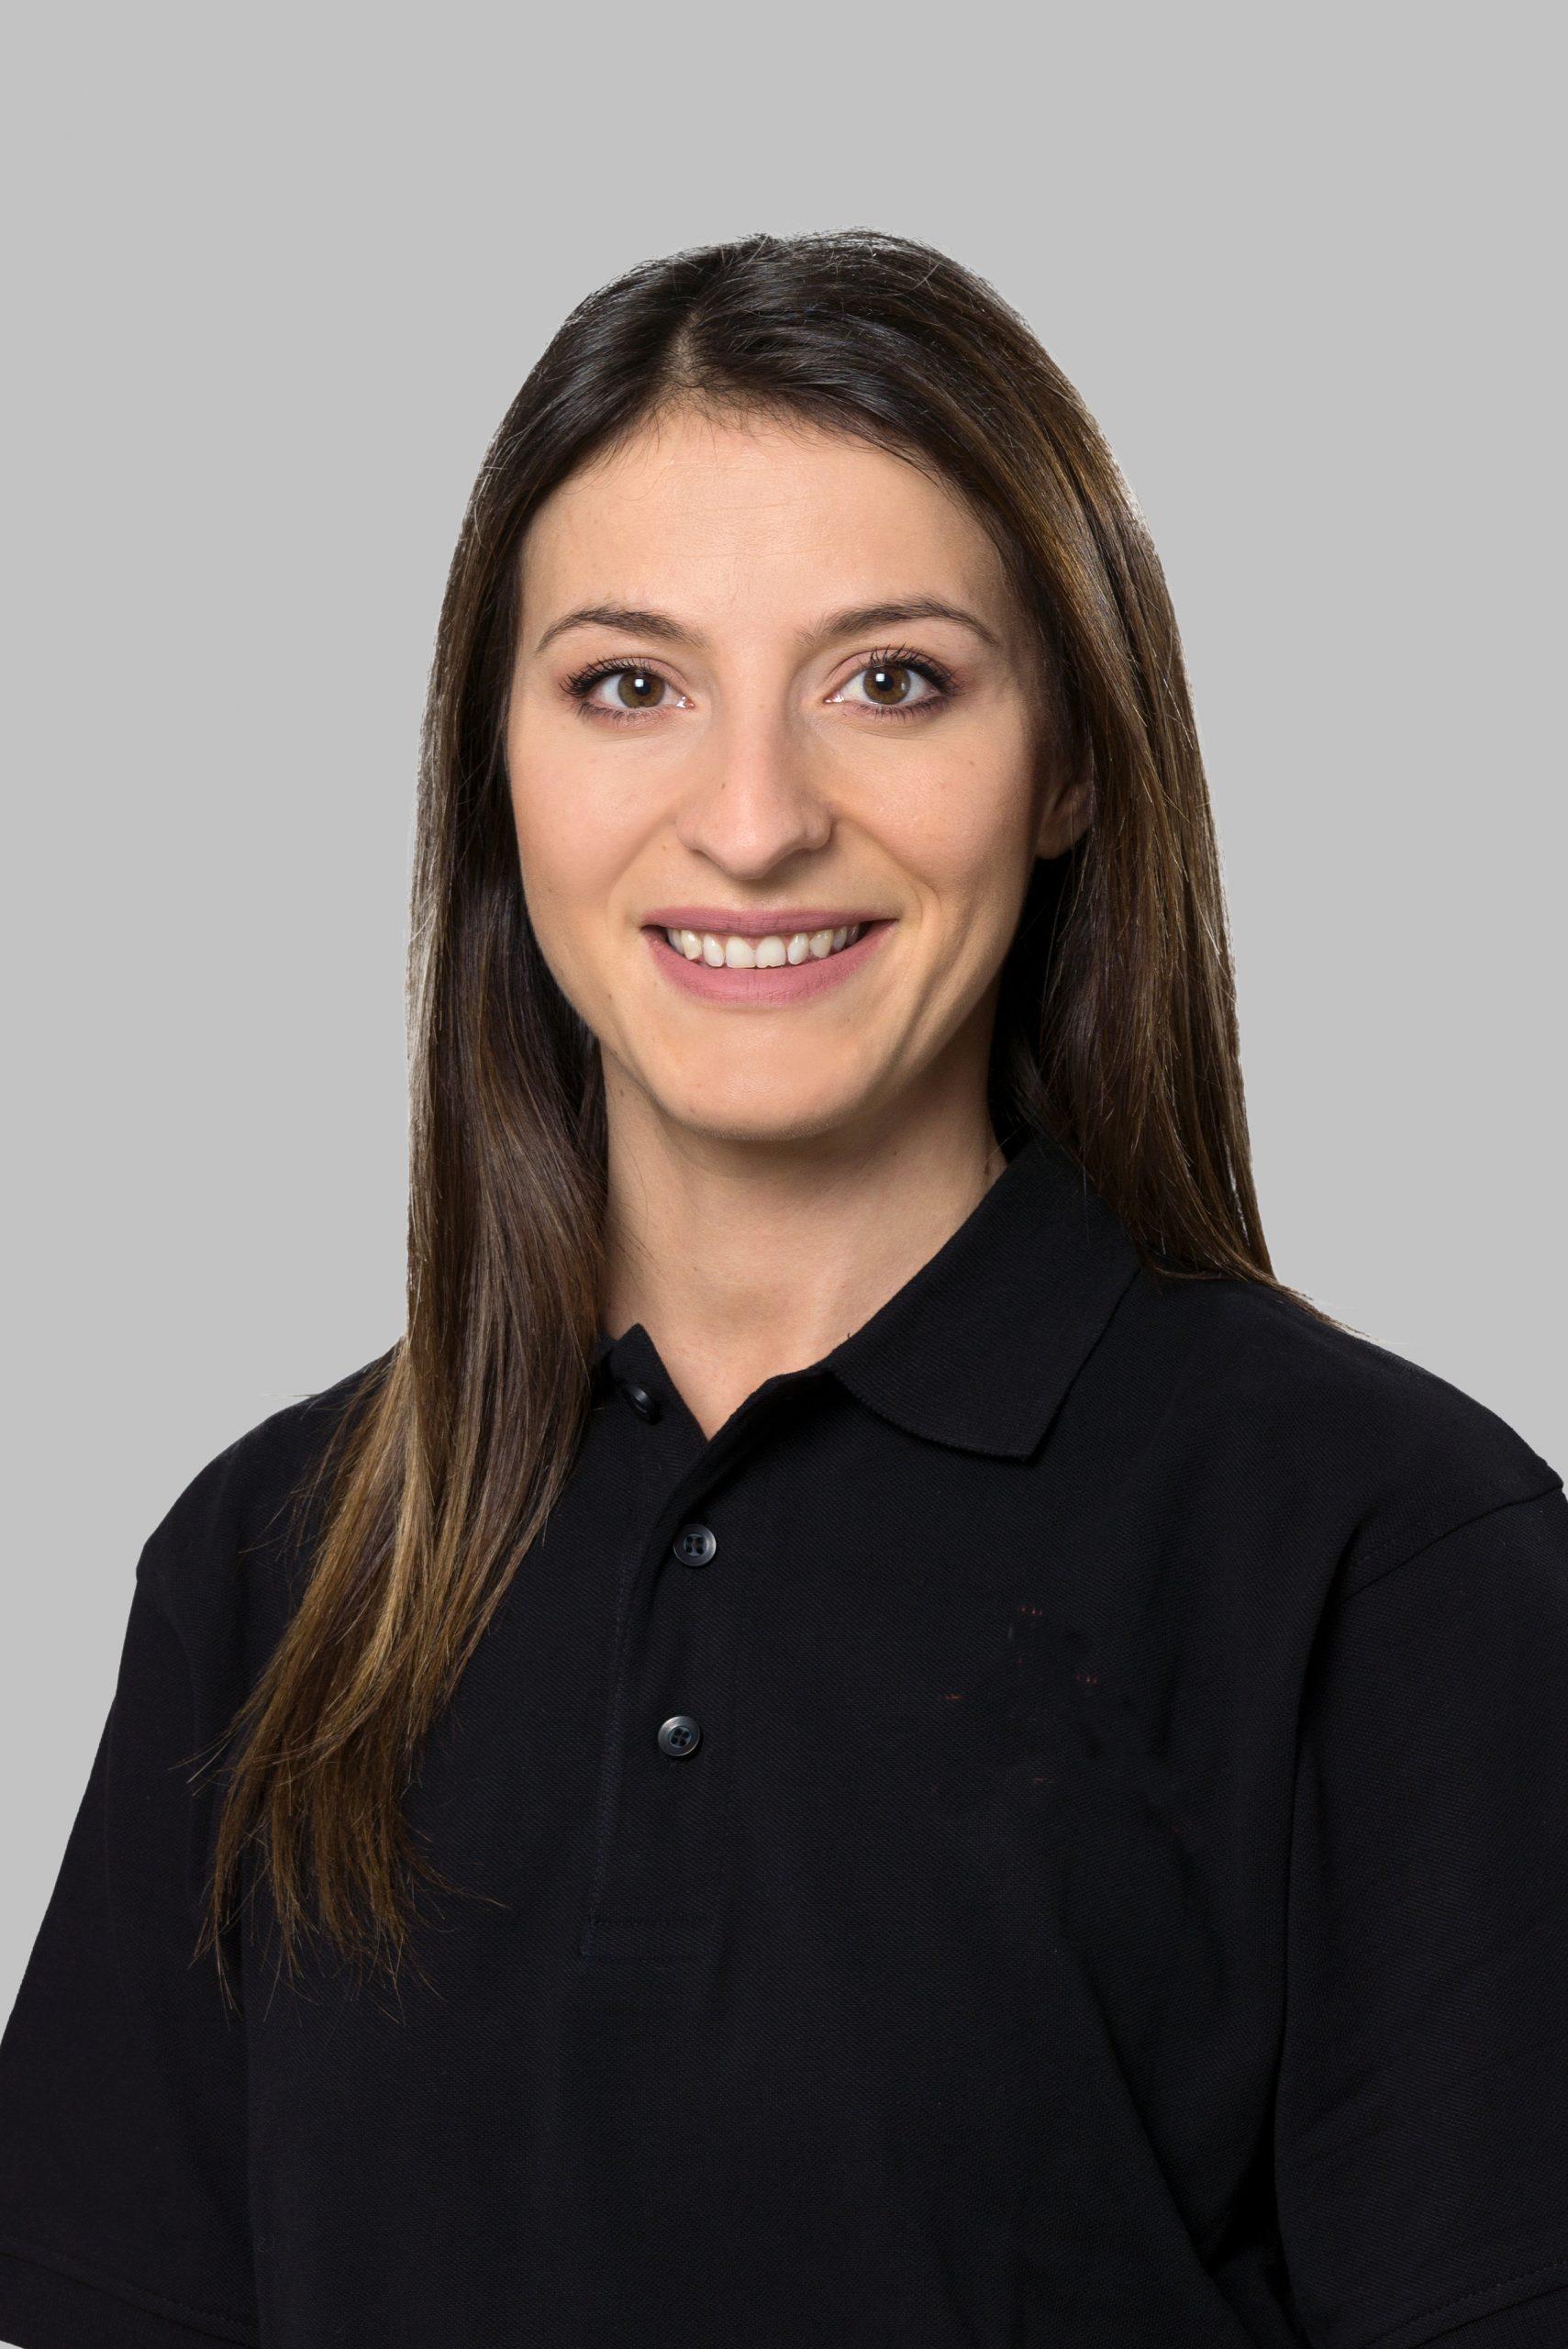 Edona Hasani